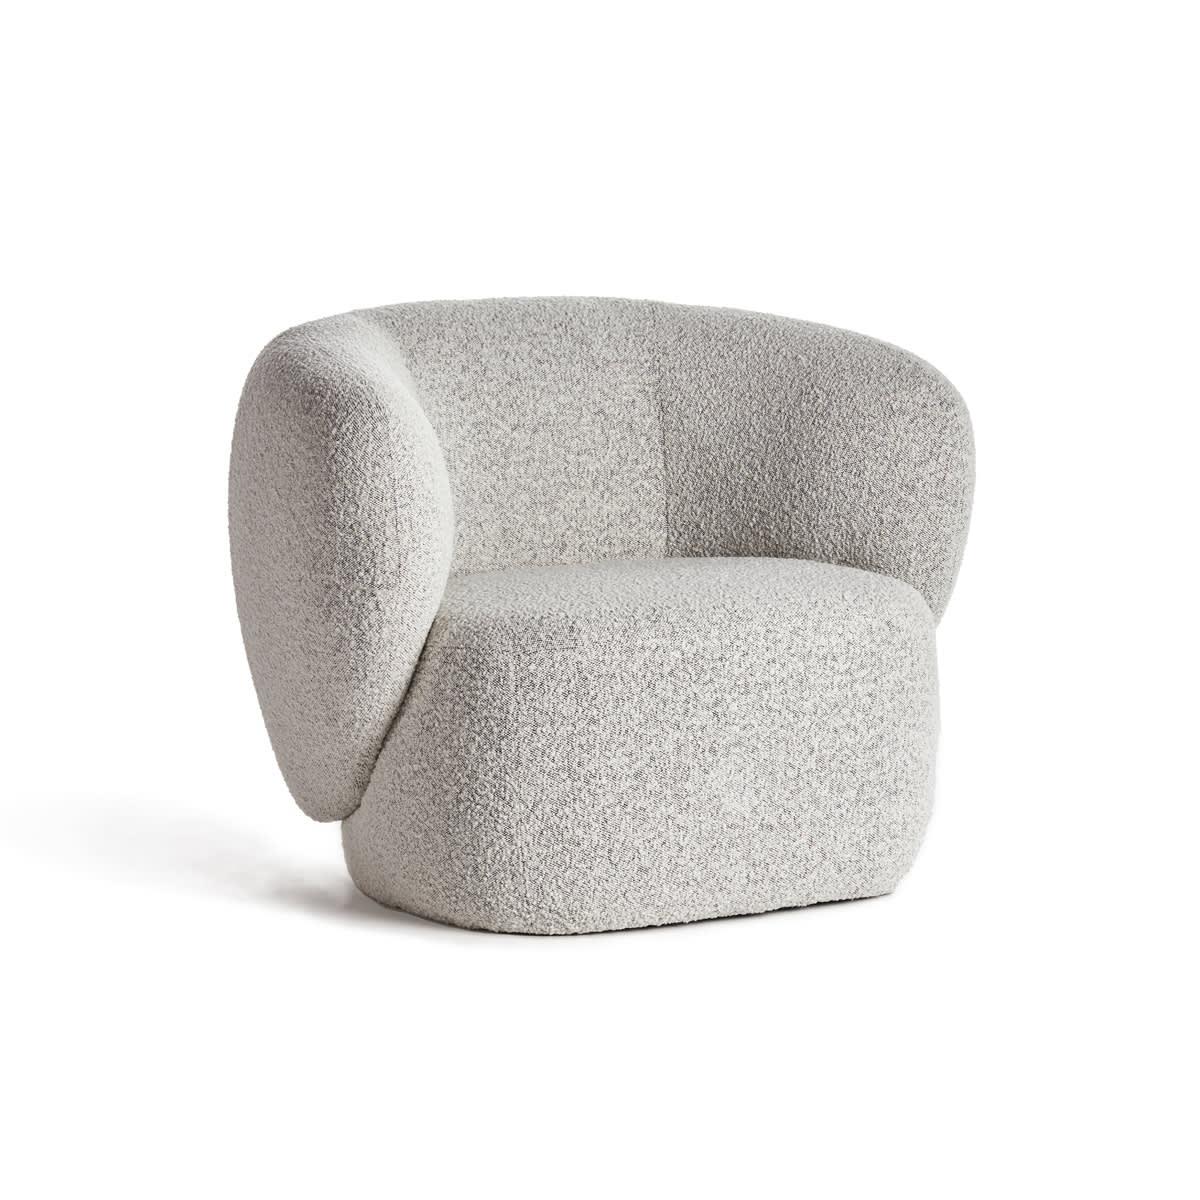 Swell Armchair - Maya Grey Boucle